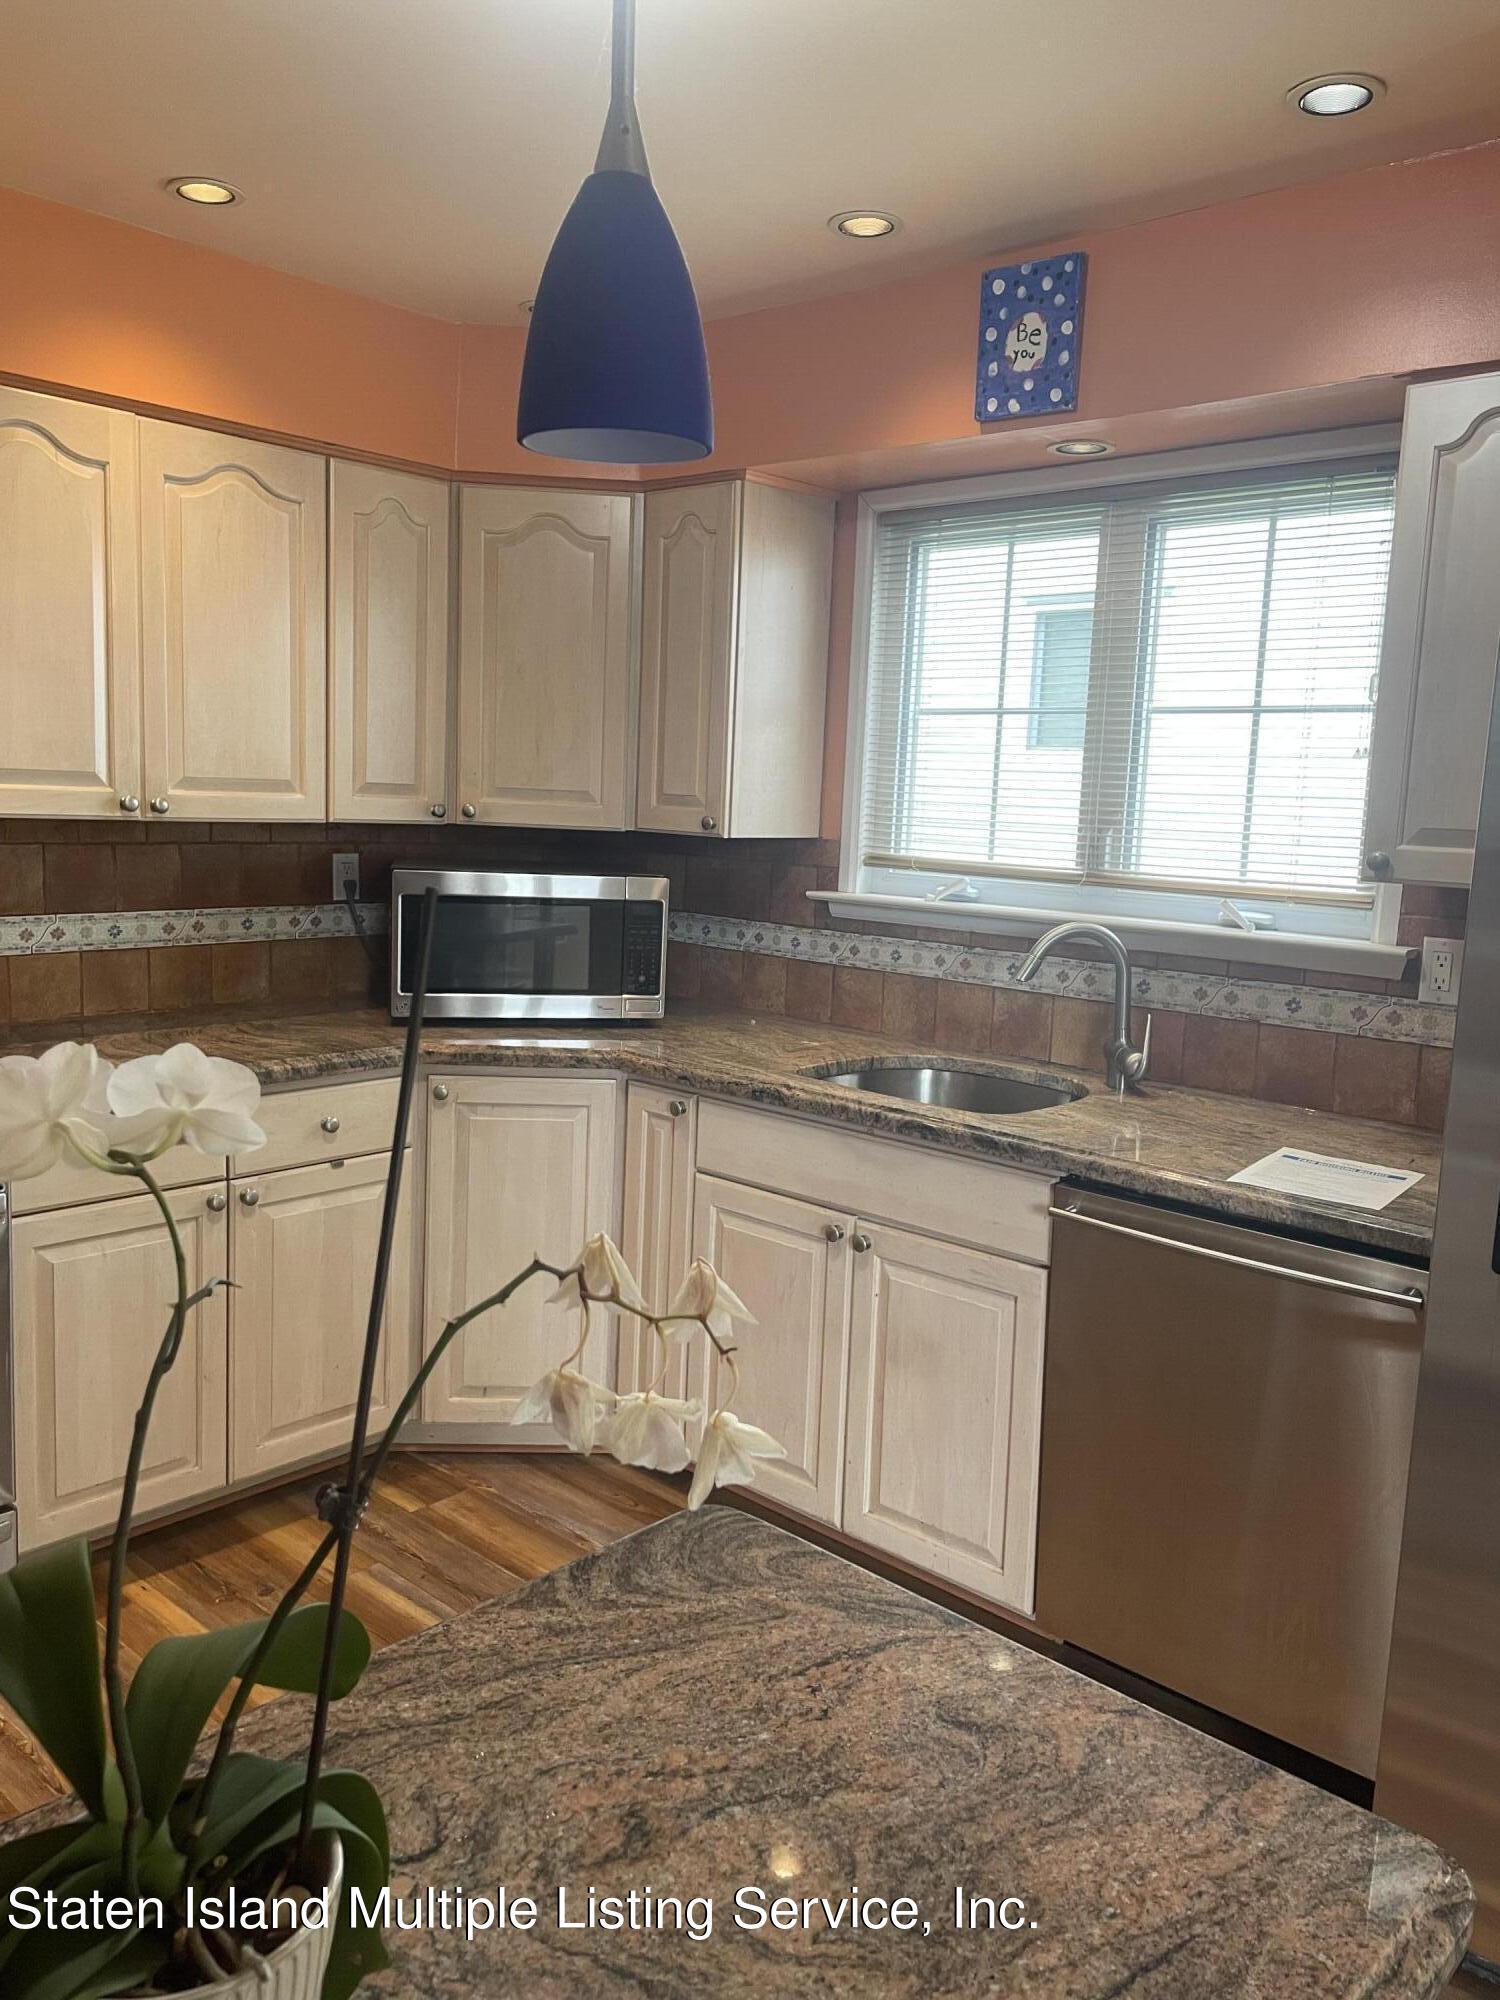 Single Family - Detached 484 Mountainview Avenue  Staten Island, NY 10314, MLS-1147175-41